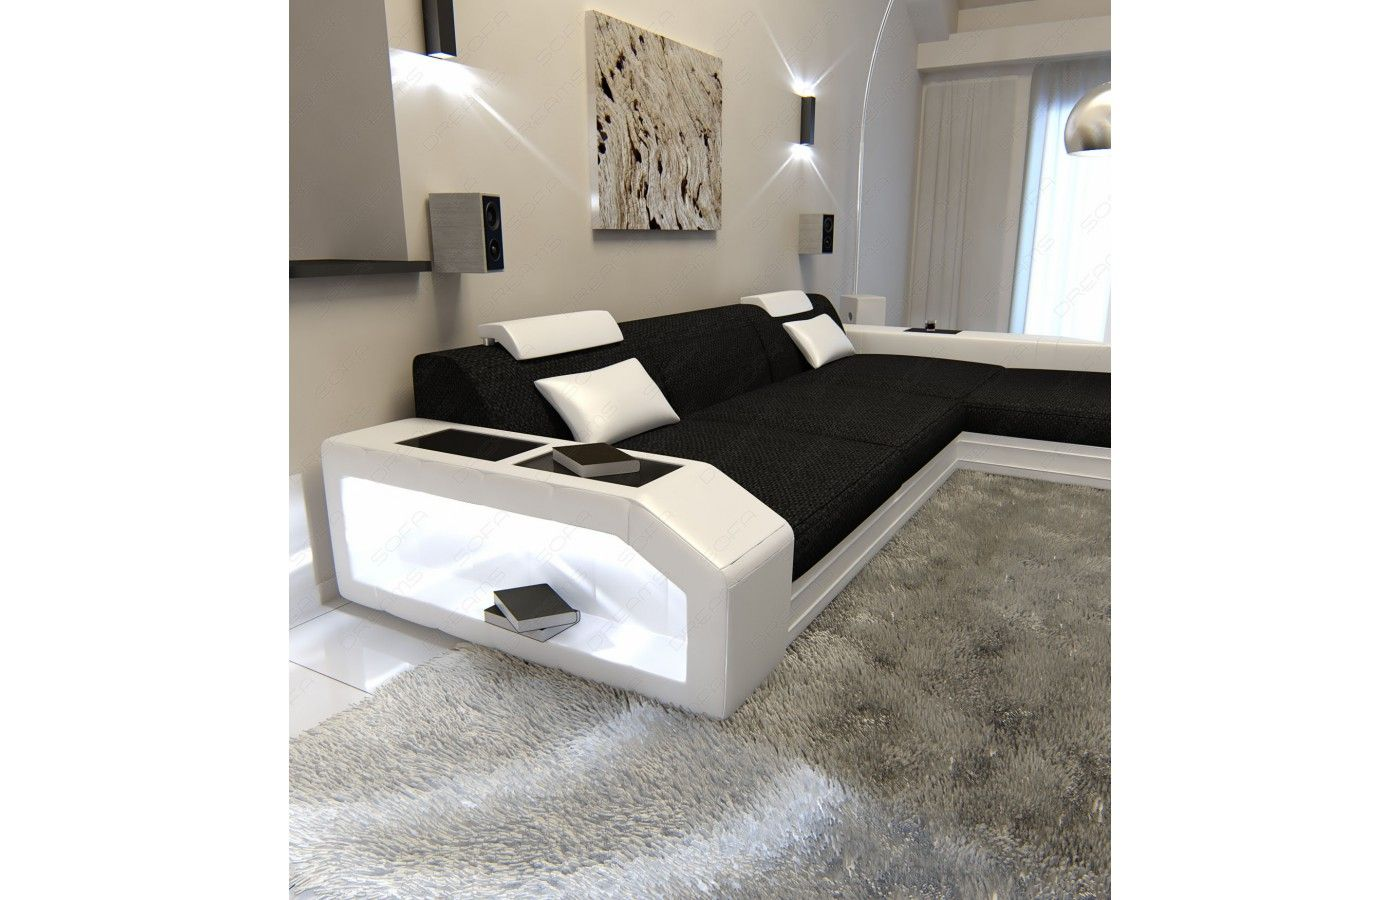 stoffsofa prato l-form in schwarz-weiß. exklusiv bei sofa dreams ... - Schwarz Wei Sofa